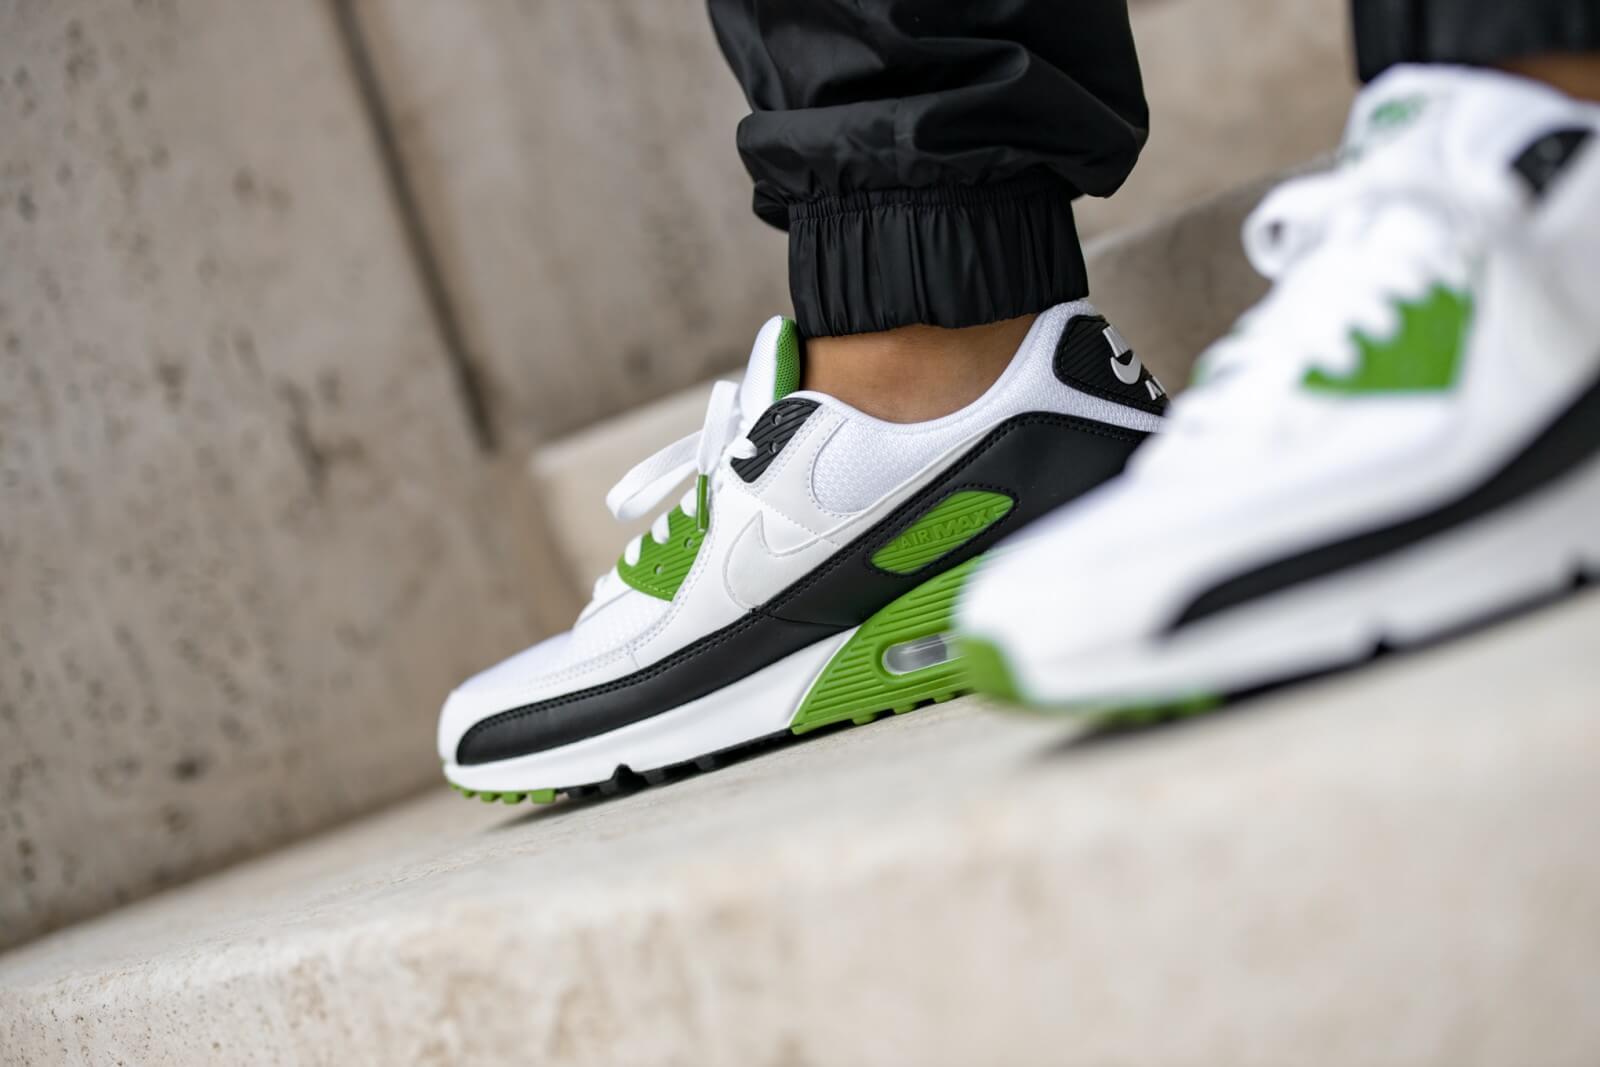 Nike Air Max 90 White/Cholorophyll-Black